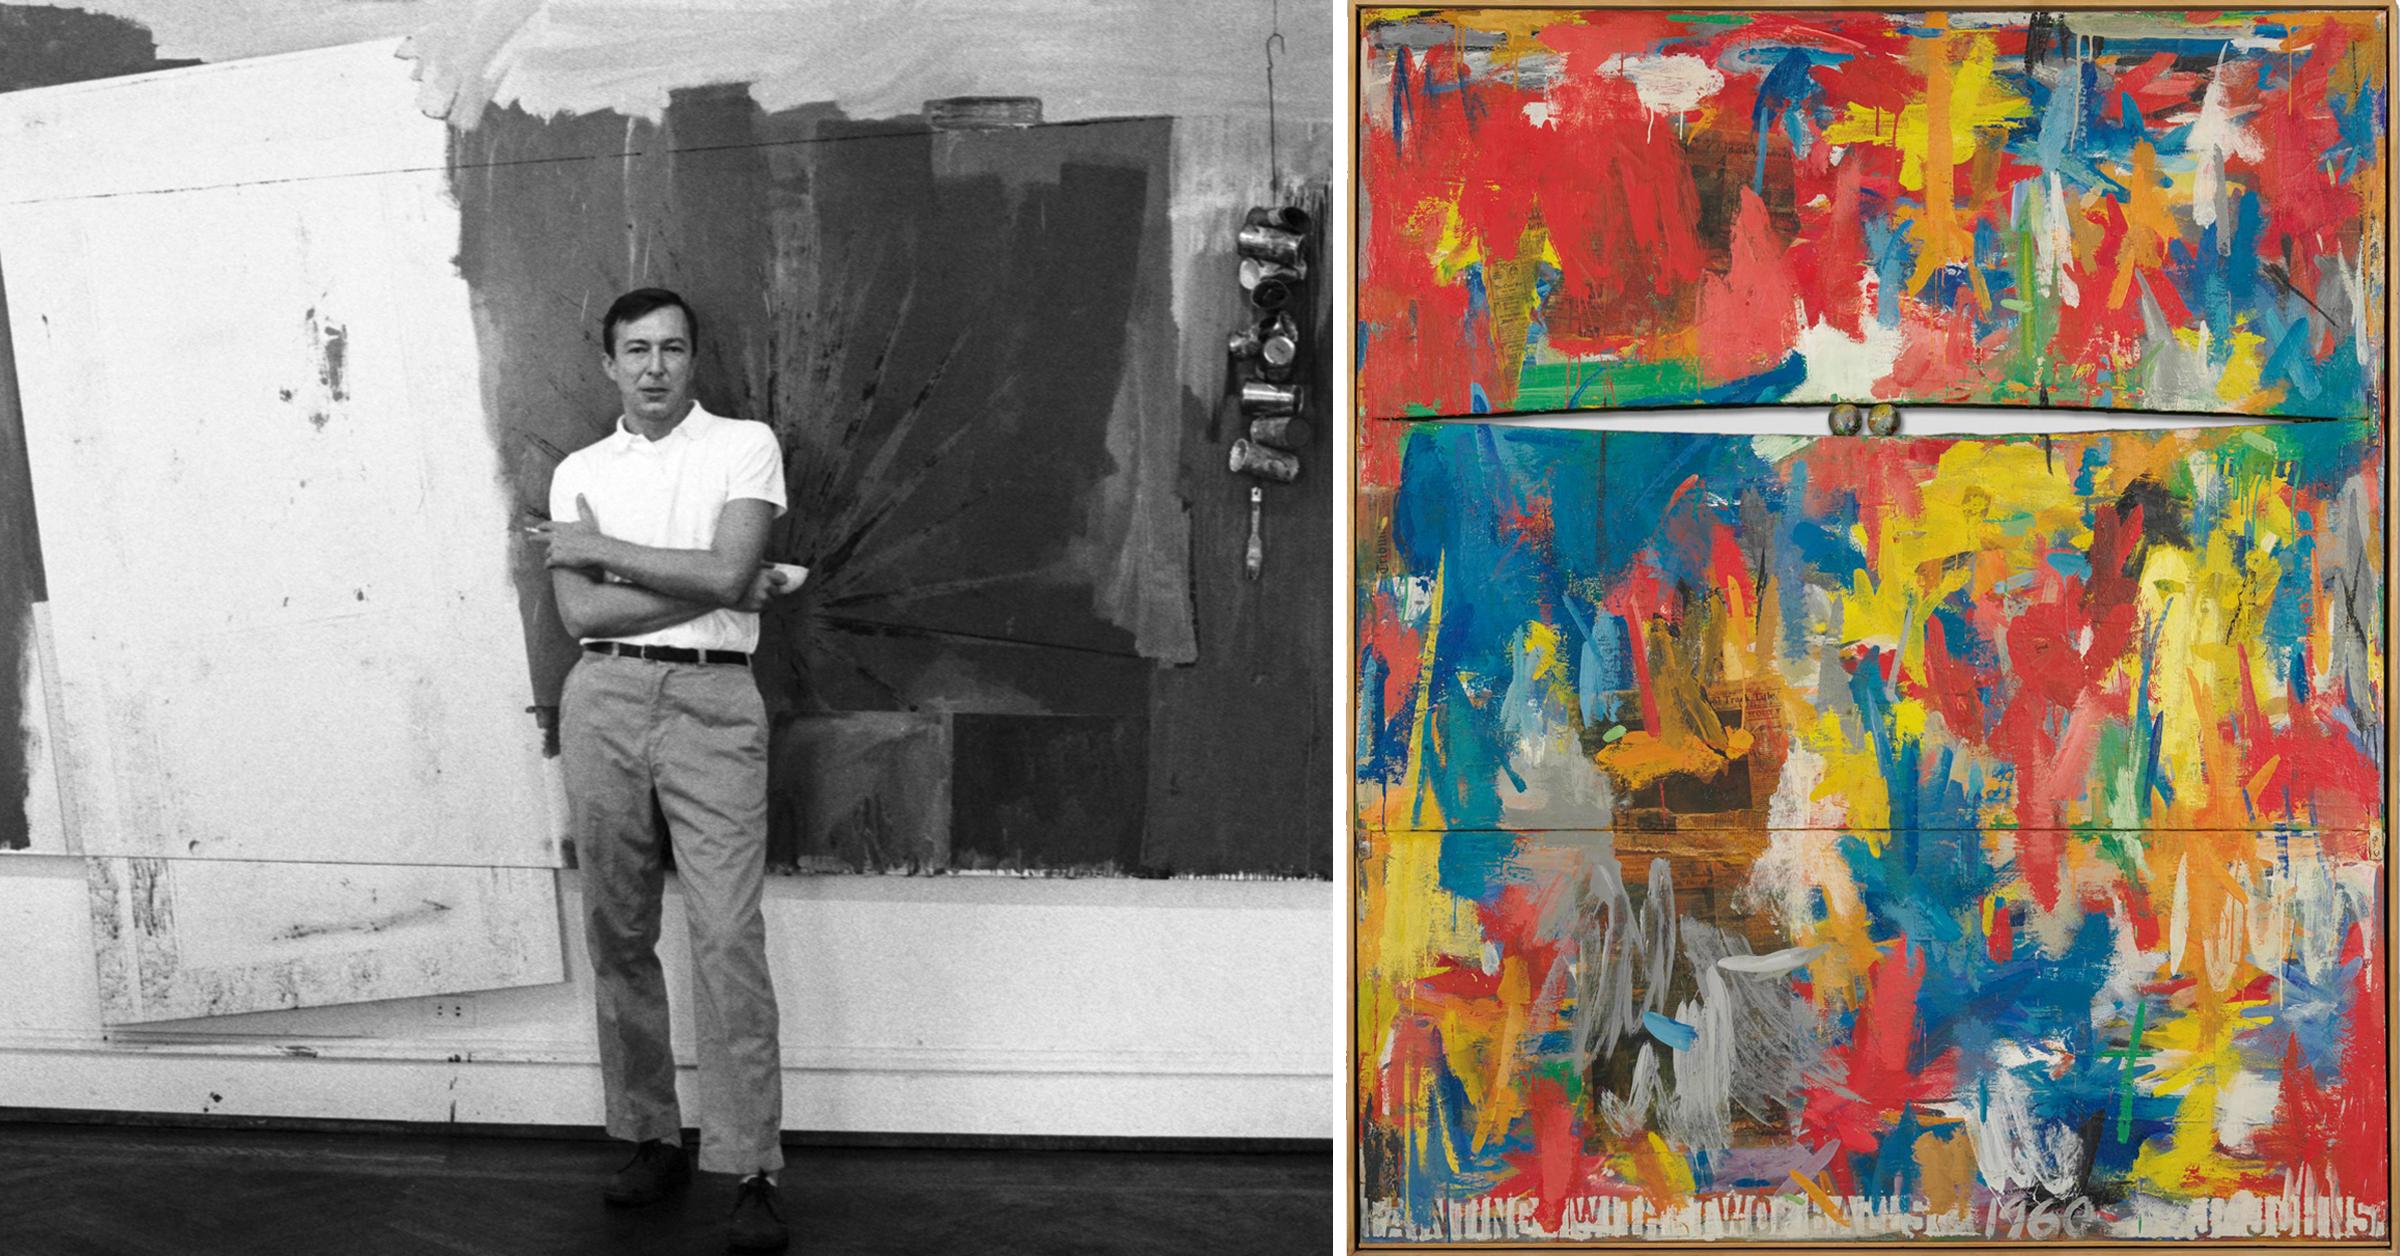 Reinventing Jasper Johns